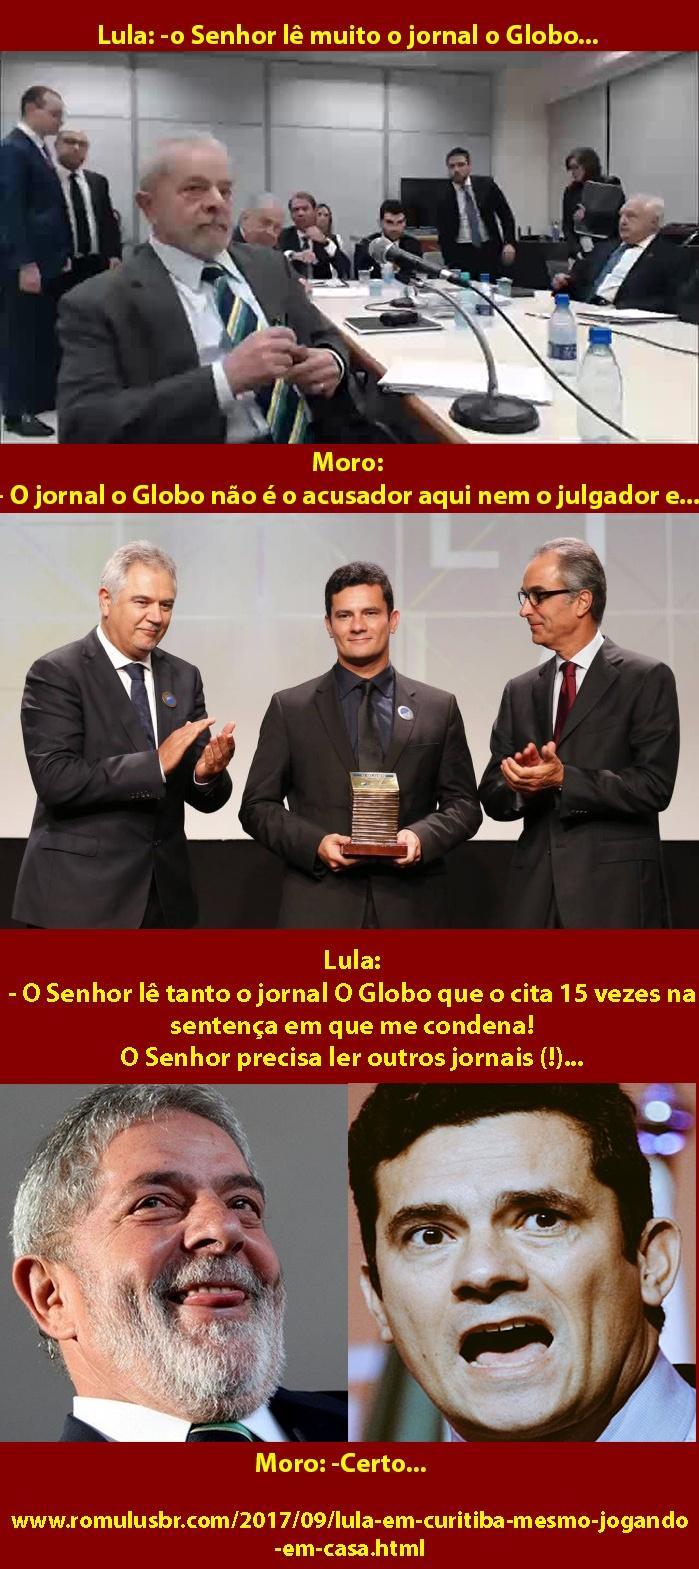 /Users/romulosoaresbrillo/Documents/Fotos Artigos/0-Organizar/Lula trolla Moro e Globo.jpg